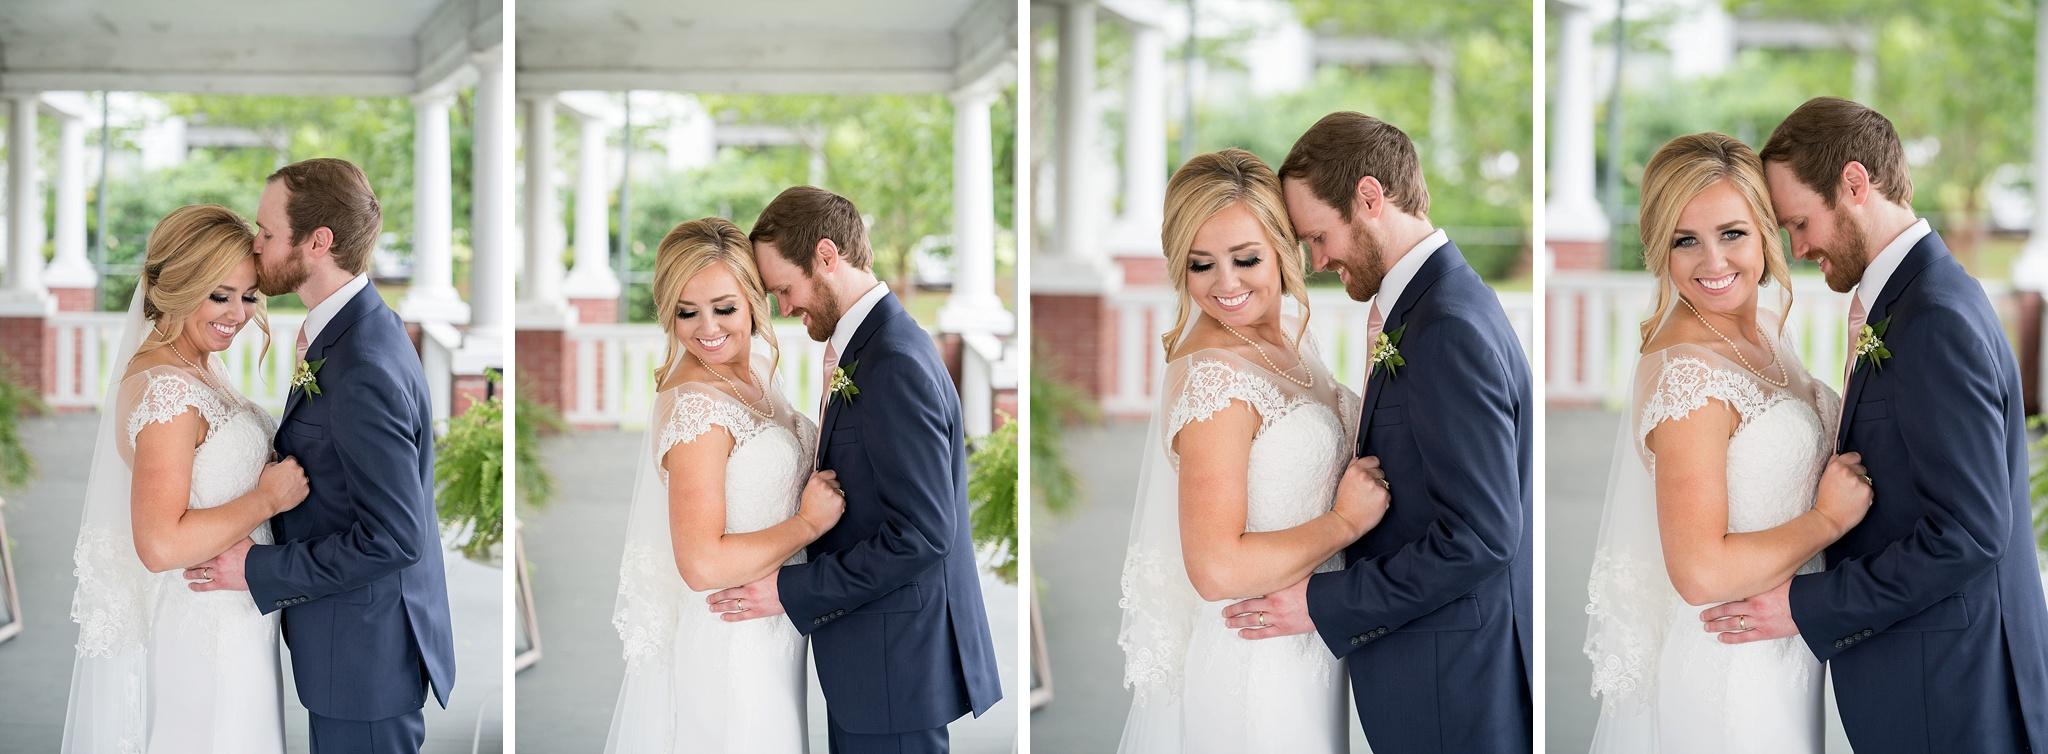 Williamston-NC-Wedding-Photographer-024.jpg